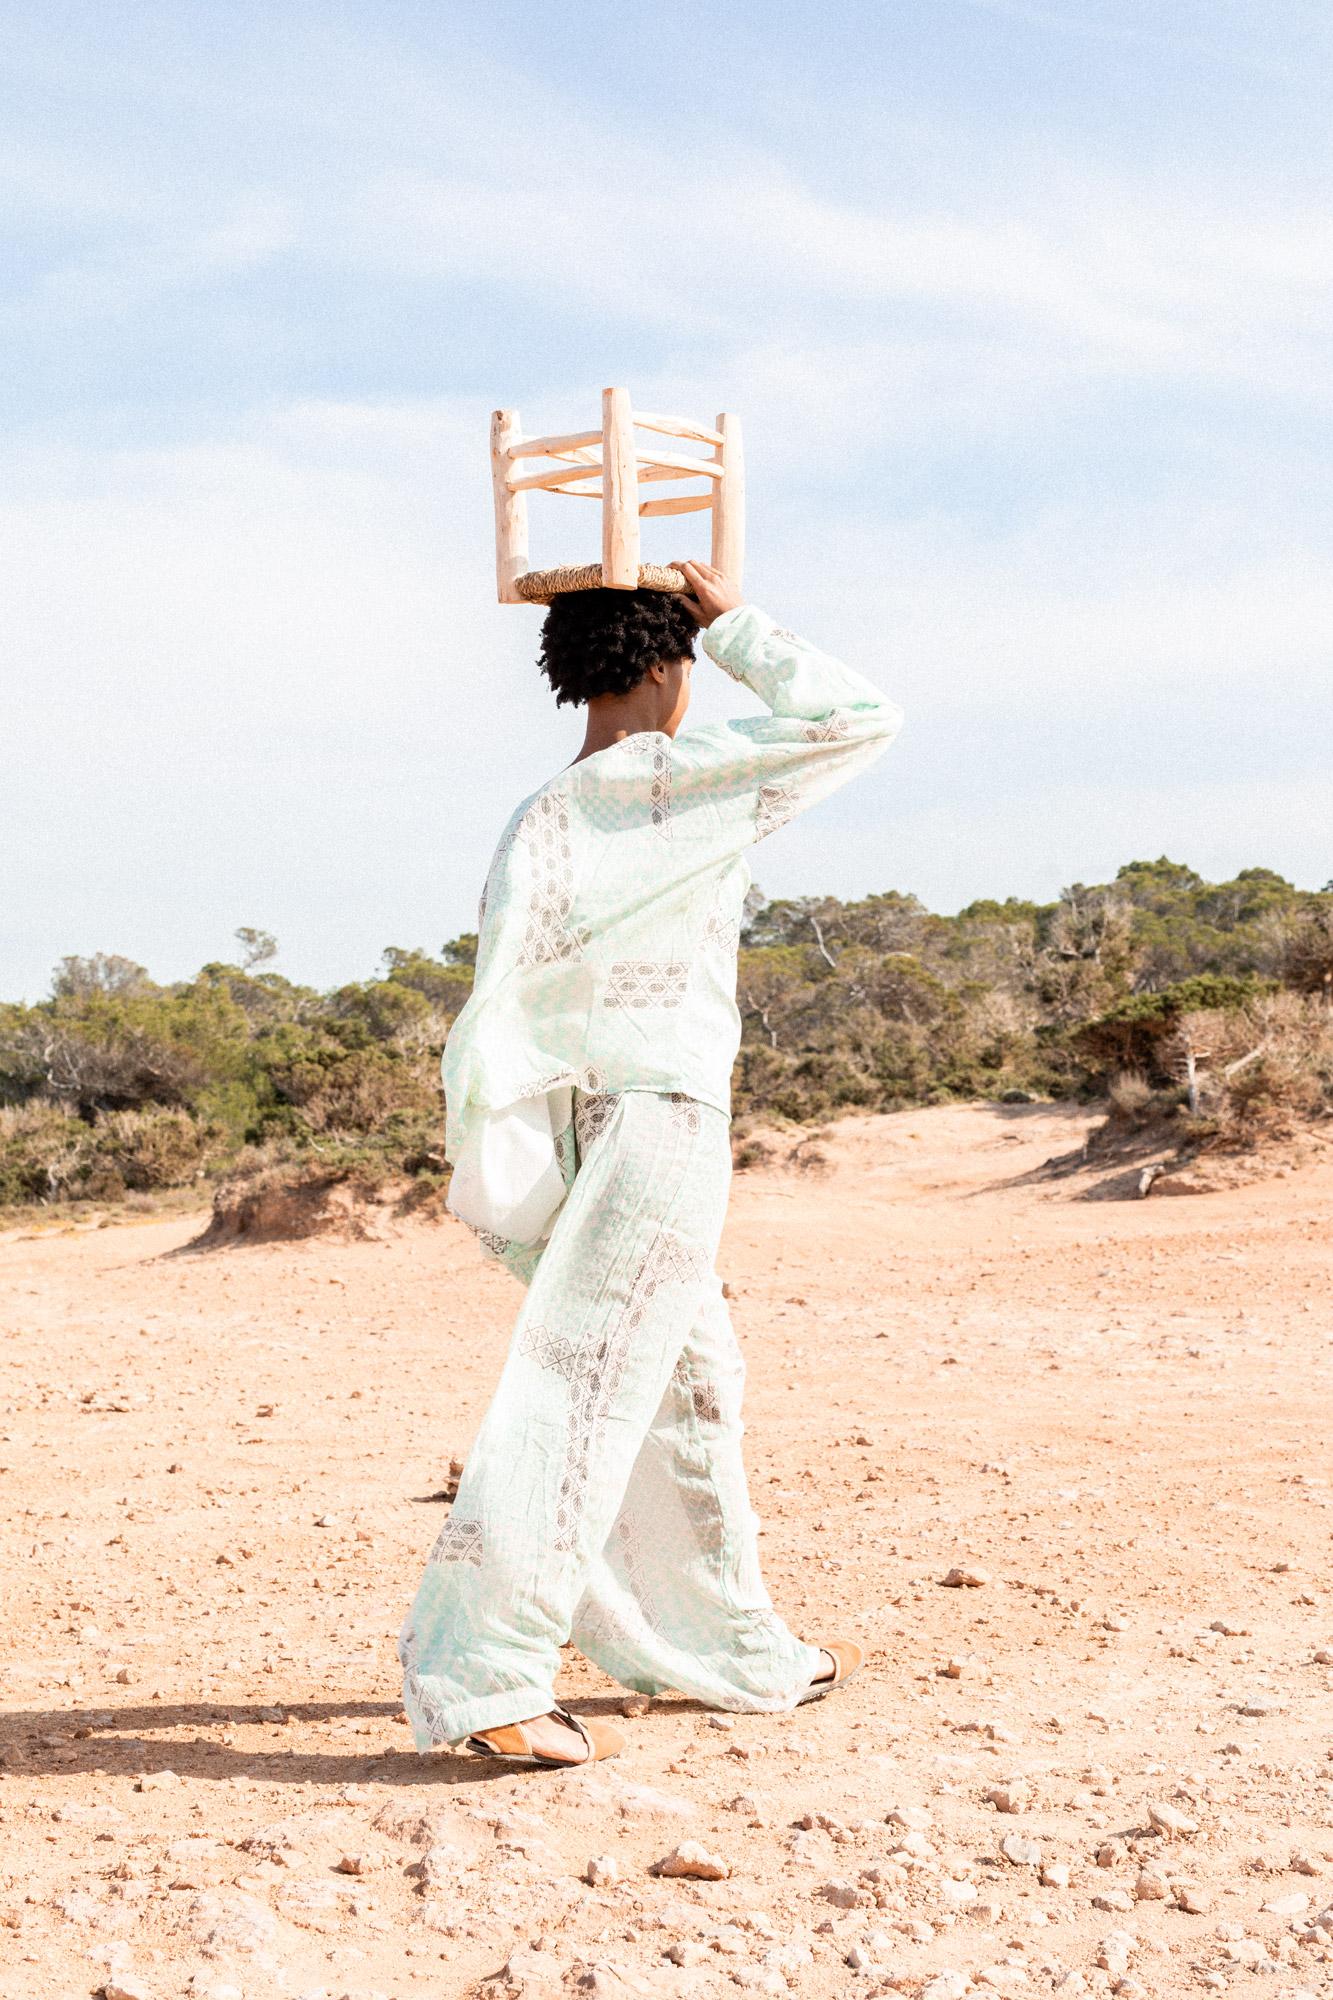 ibiza - photographer - artist - lifestyle - mariasantos - arti - model - shooting - beach - island